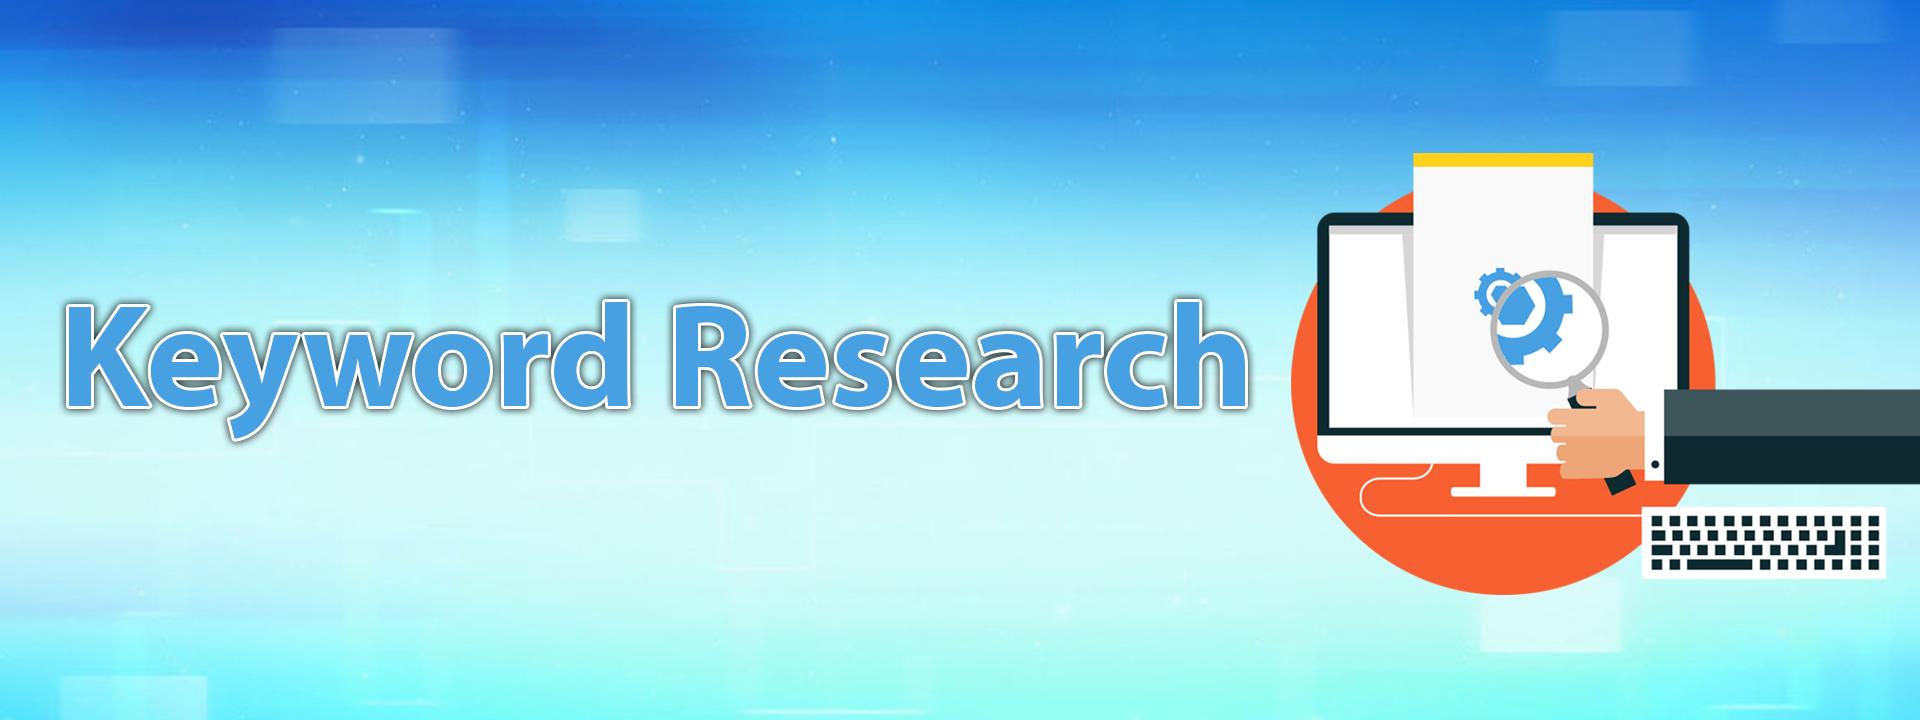 Keyword Research - Artech Digital